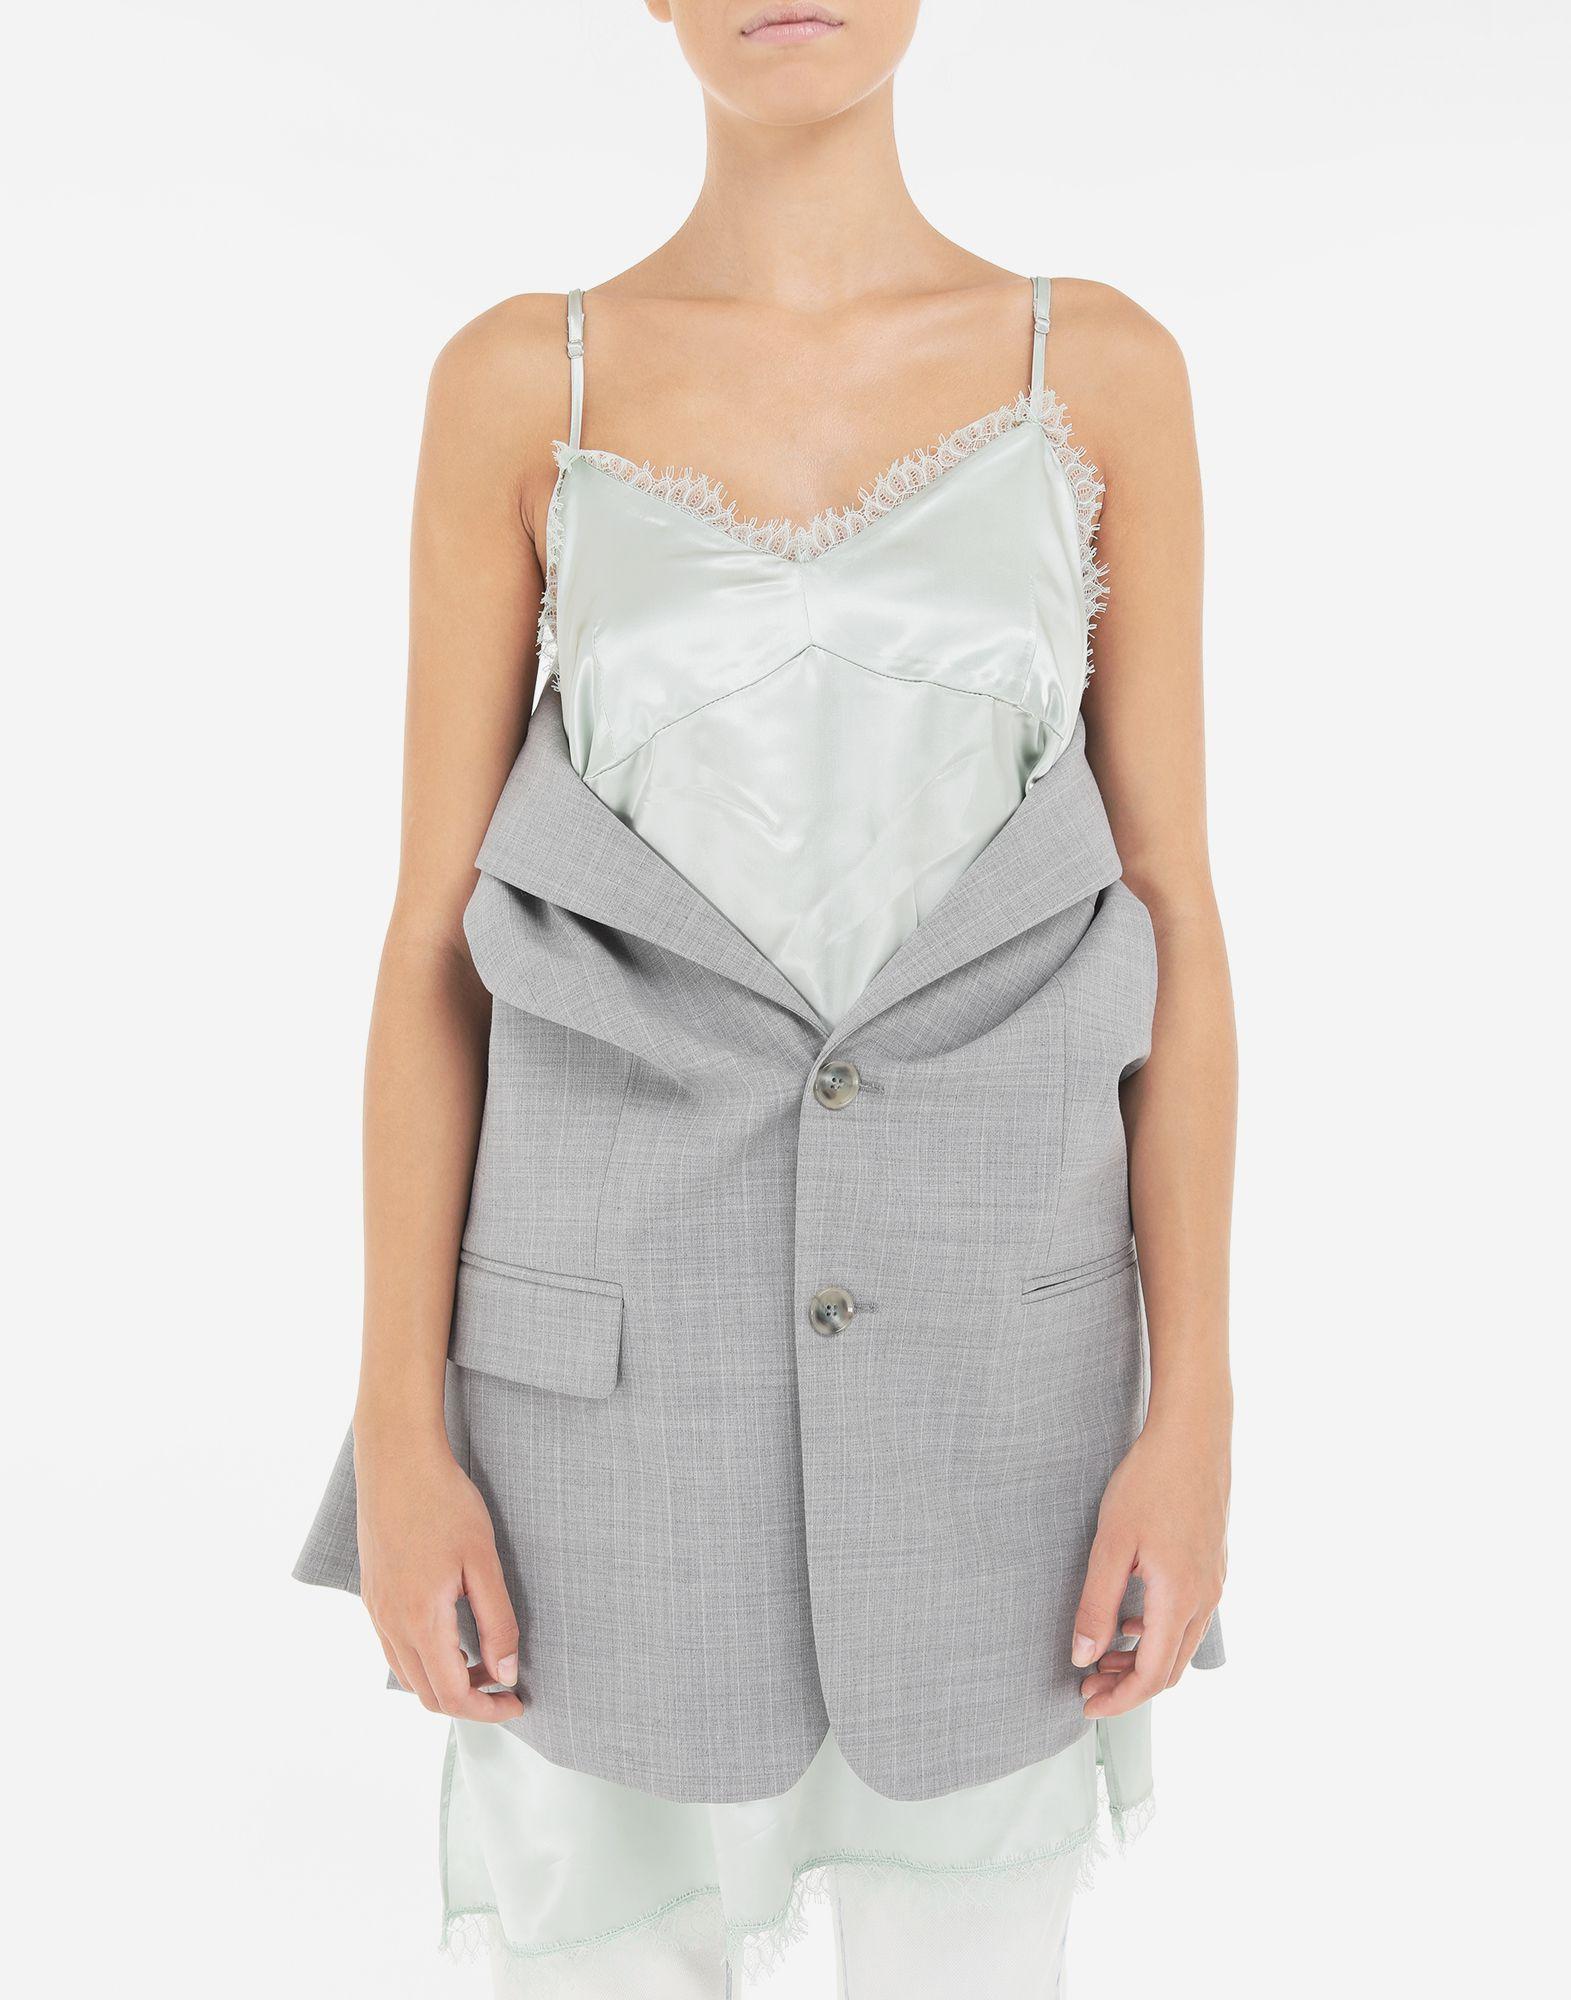 MM6 MAISON MARGIELA Multi-wear blazer Blazer Woman a